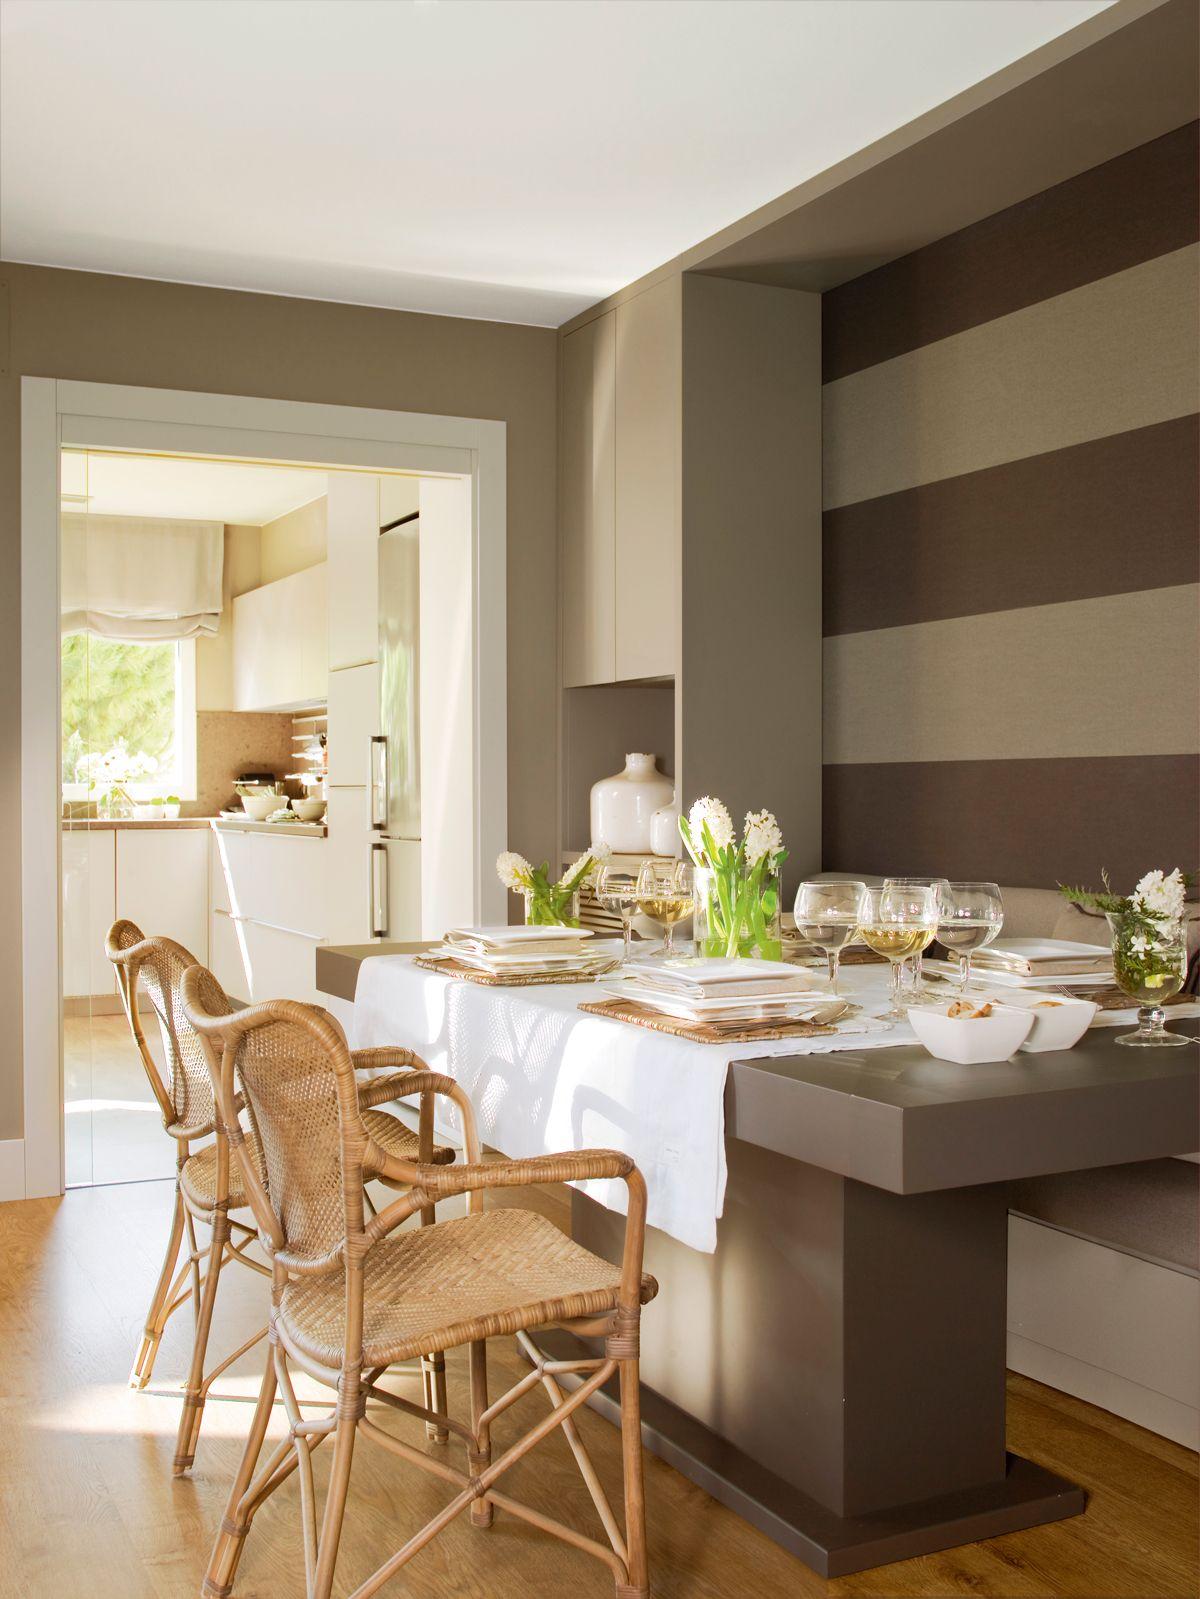 Ba o con azulejos blancos y papel pintado a rayas for Papel pintado madera blanca